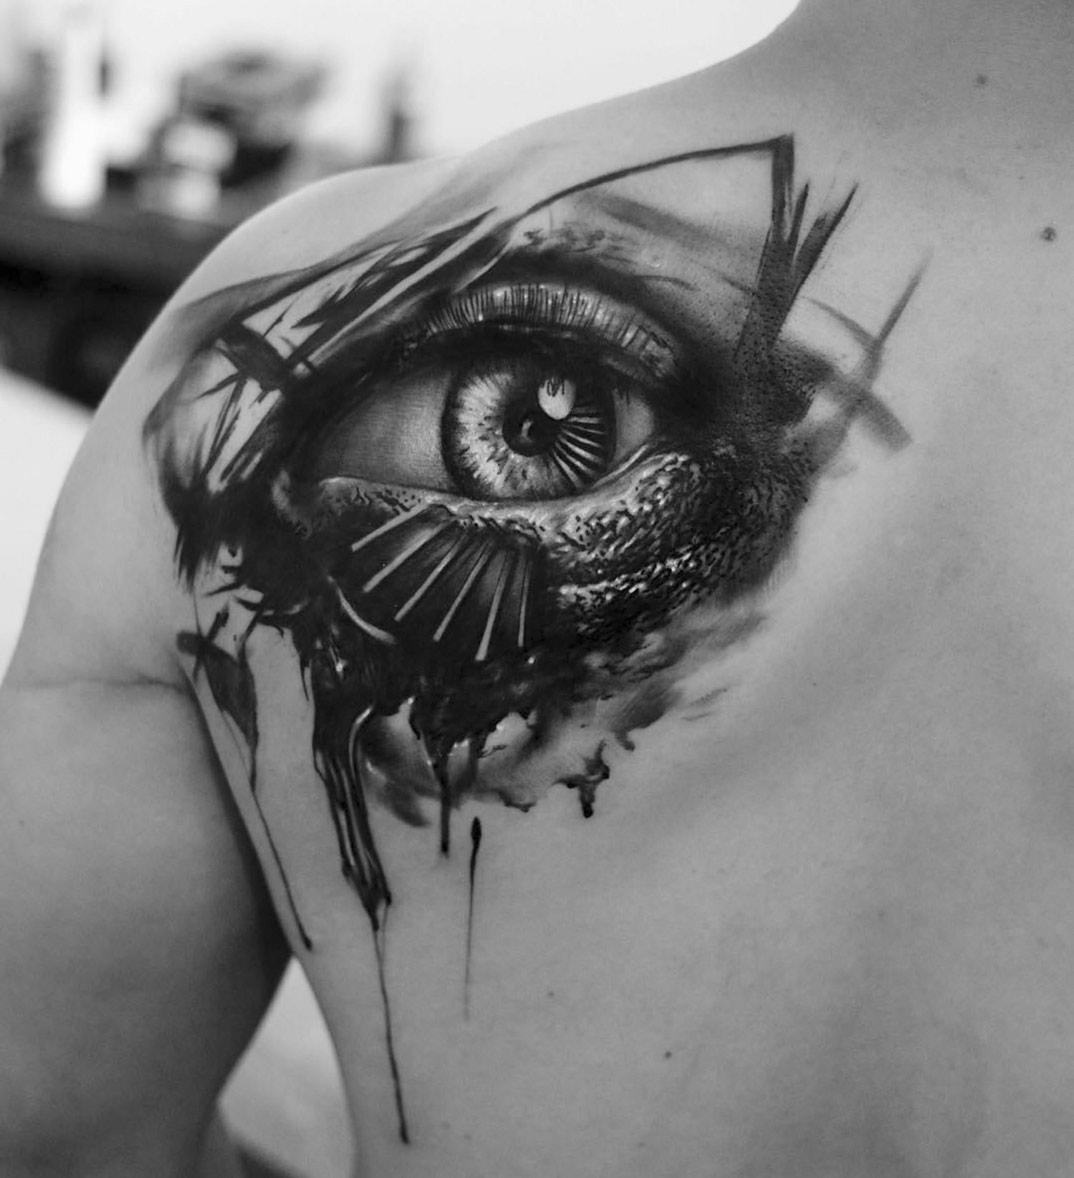 drammatici-ritratti-misteriosi-tatuaggi-monocromatici-kurt-staudinger-01